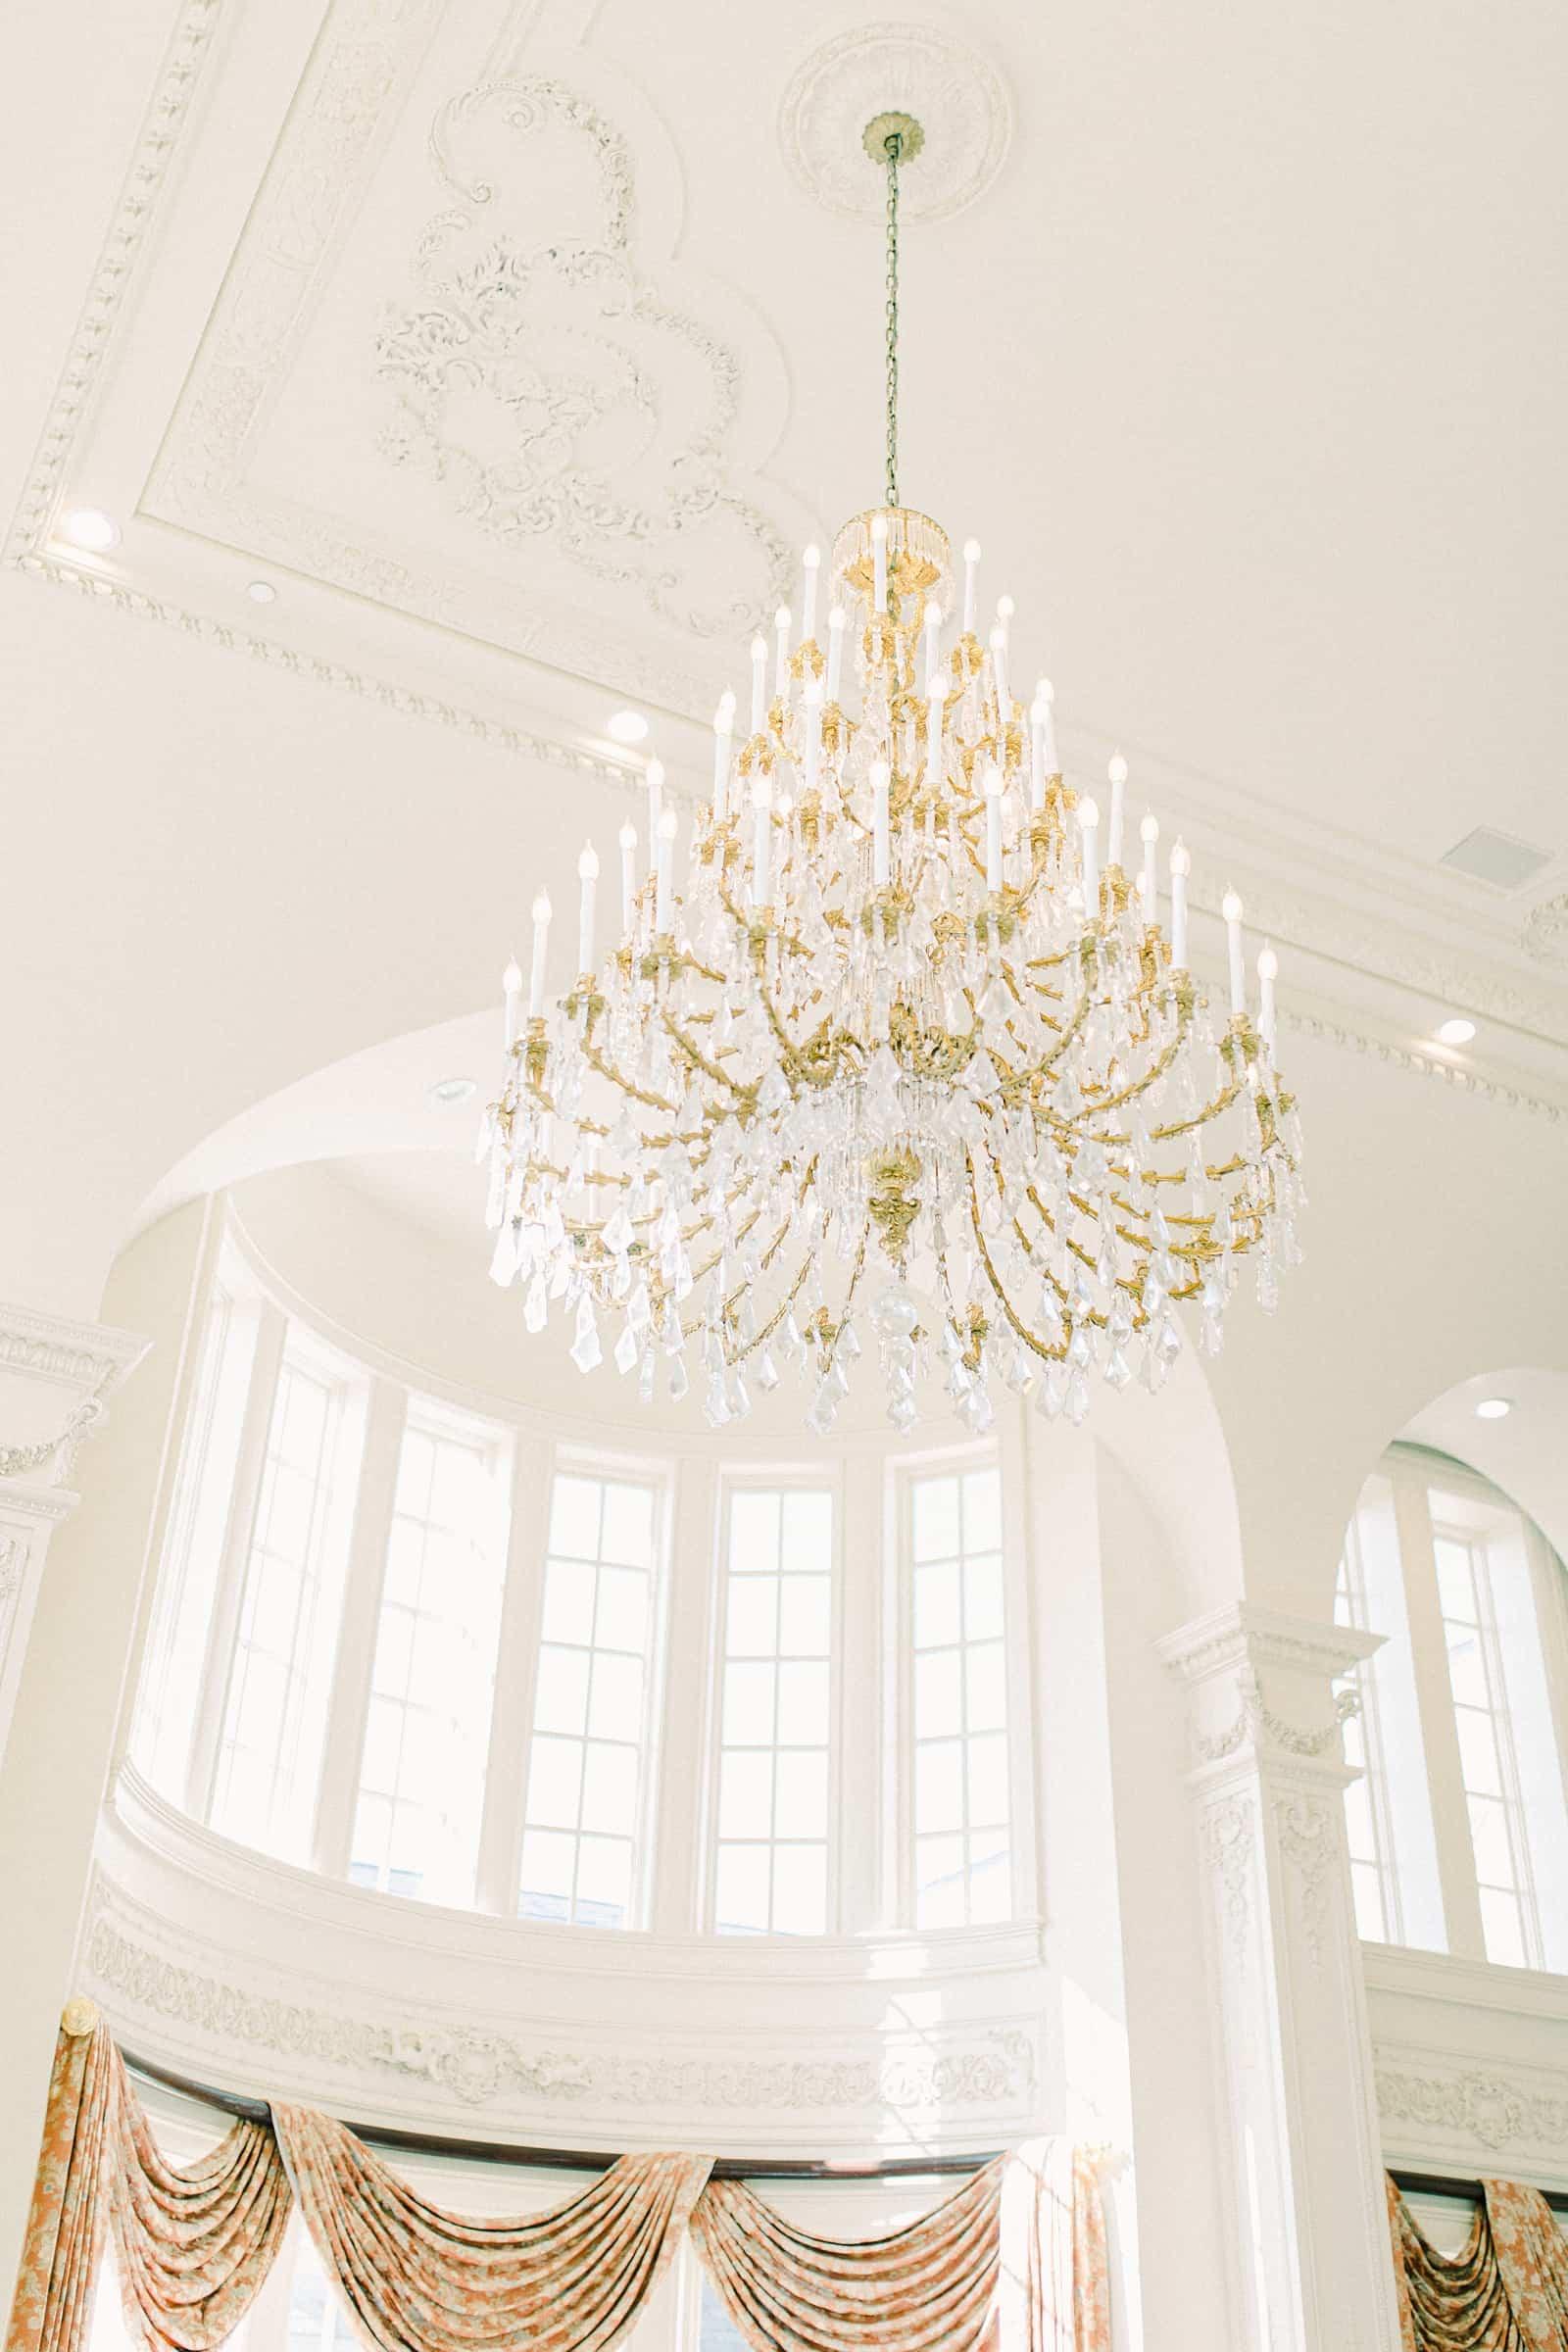 Ballroom chandelier at the Olana, destination wedding venue